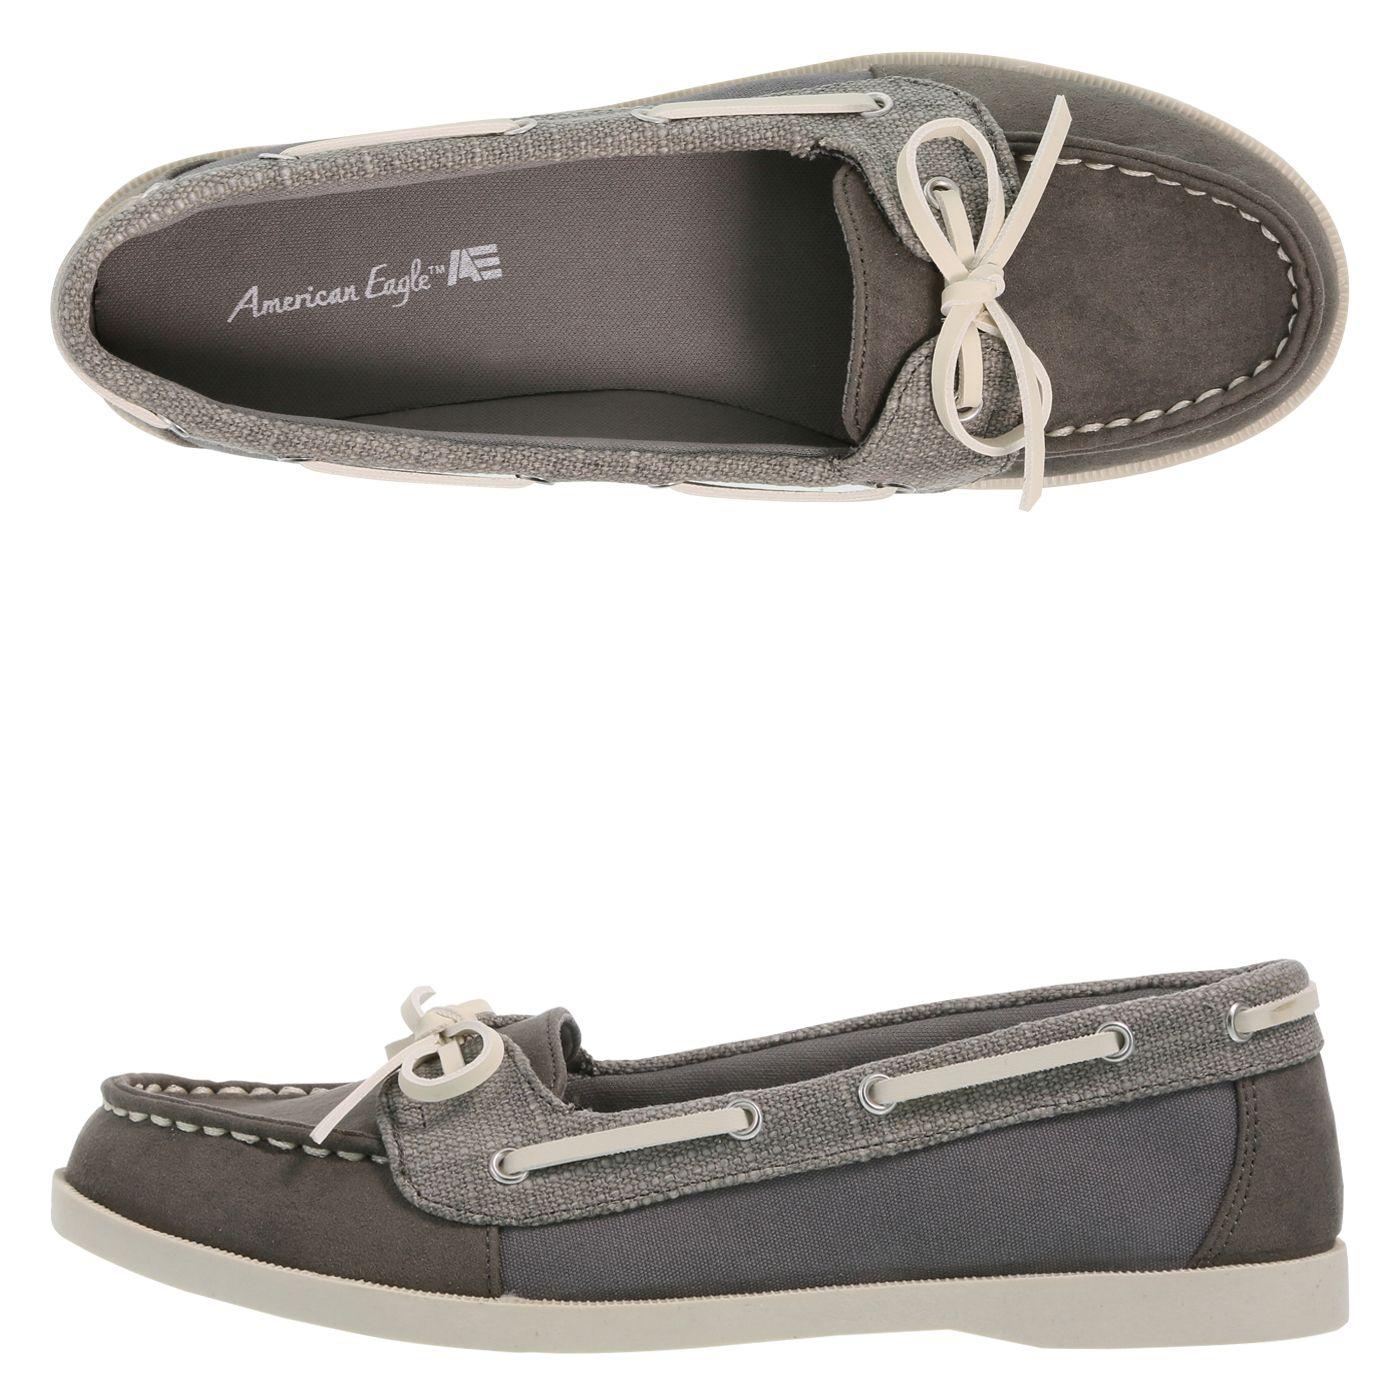 54540b5755b Penny Loafer · American Eagle Beck Women s Shoe